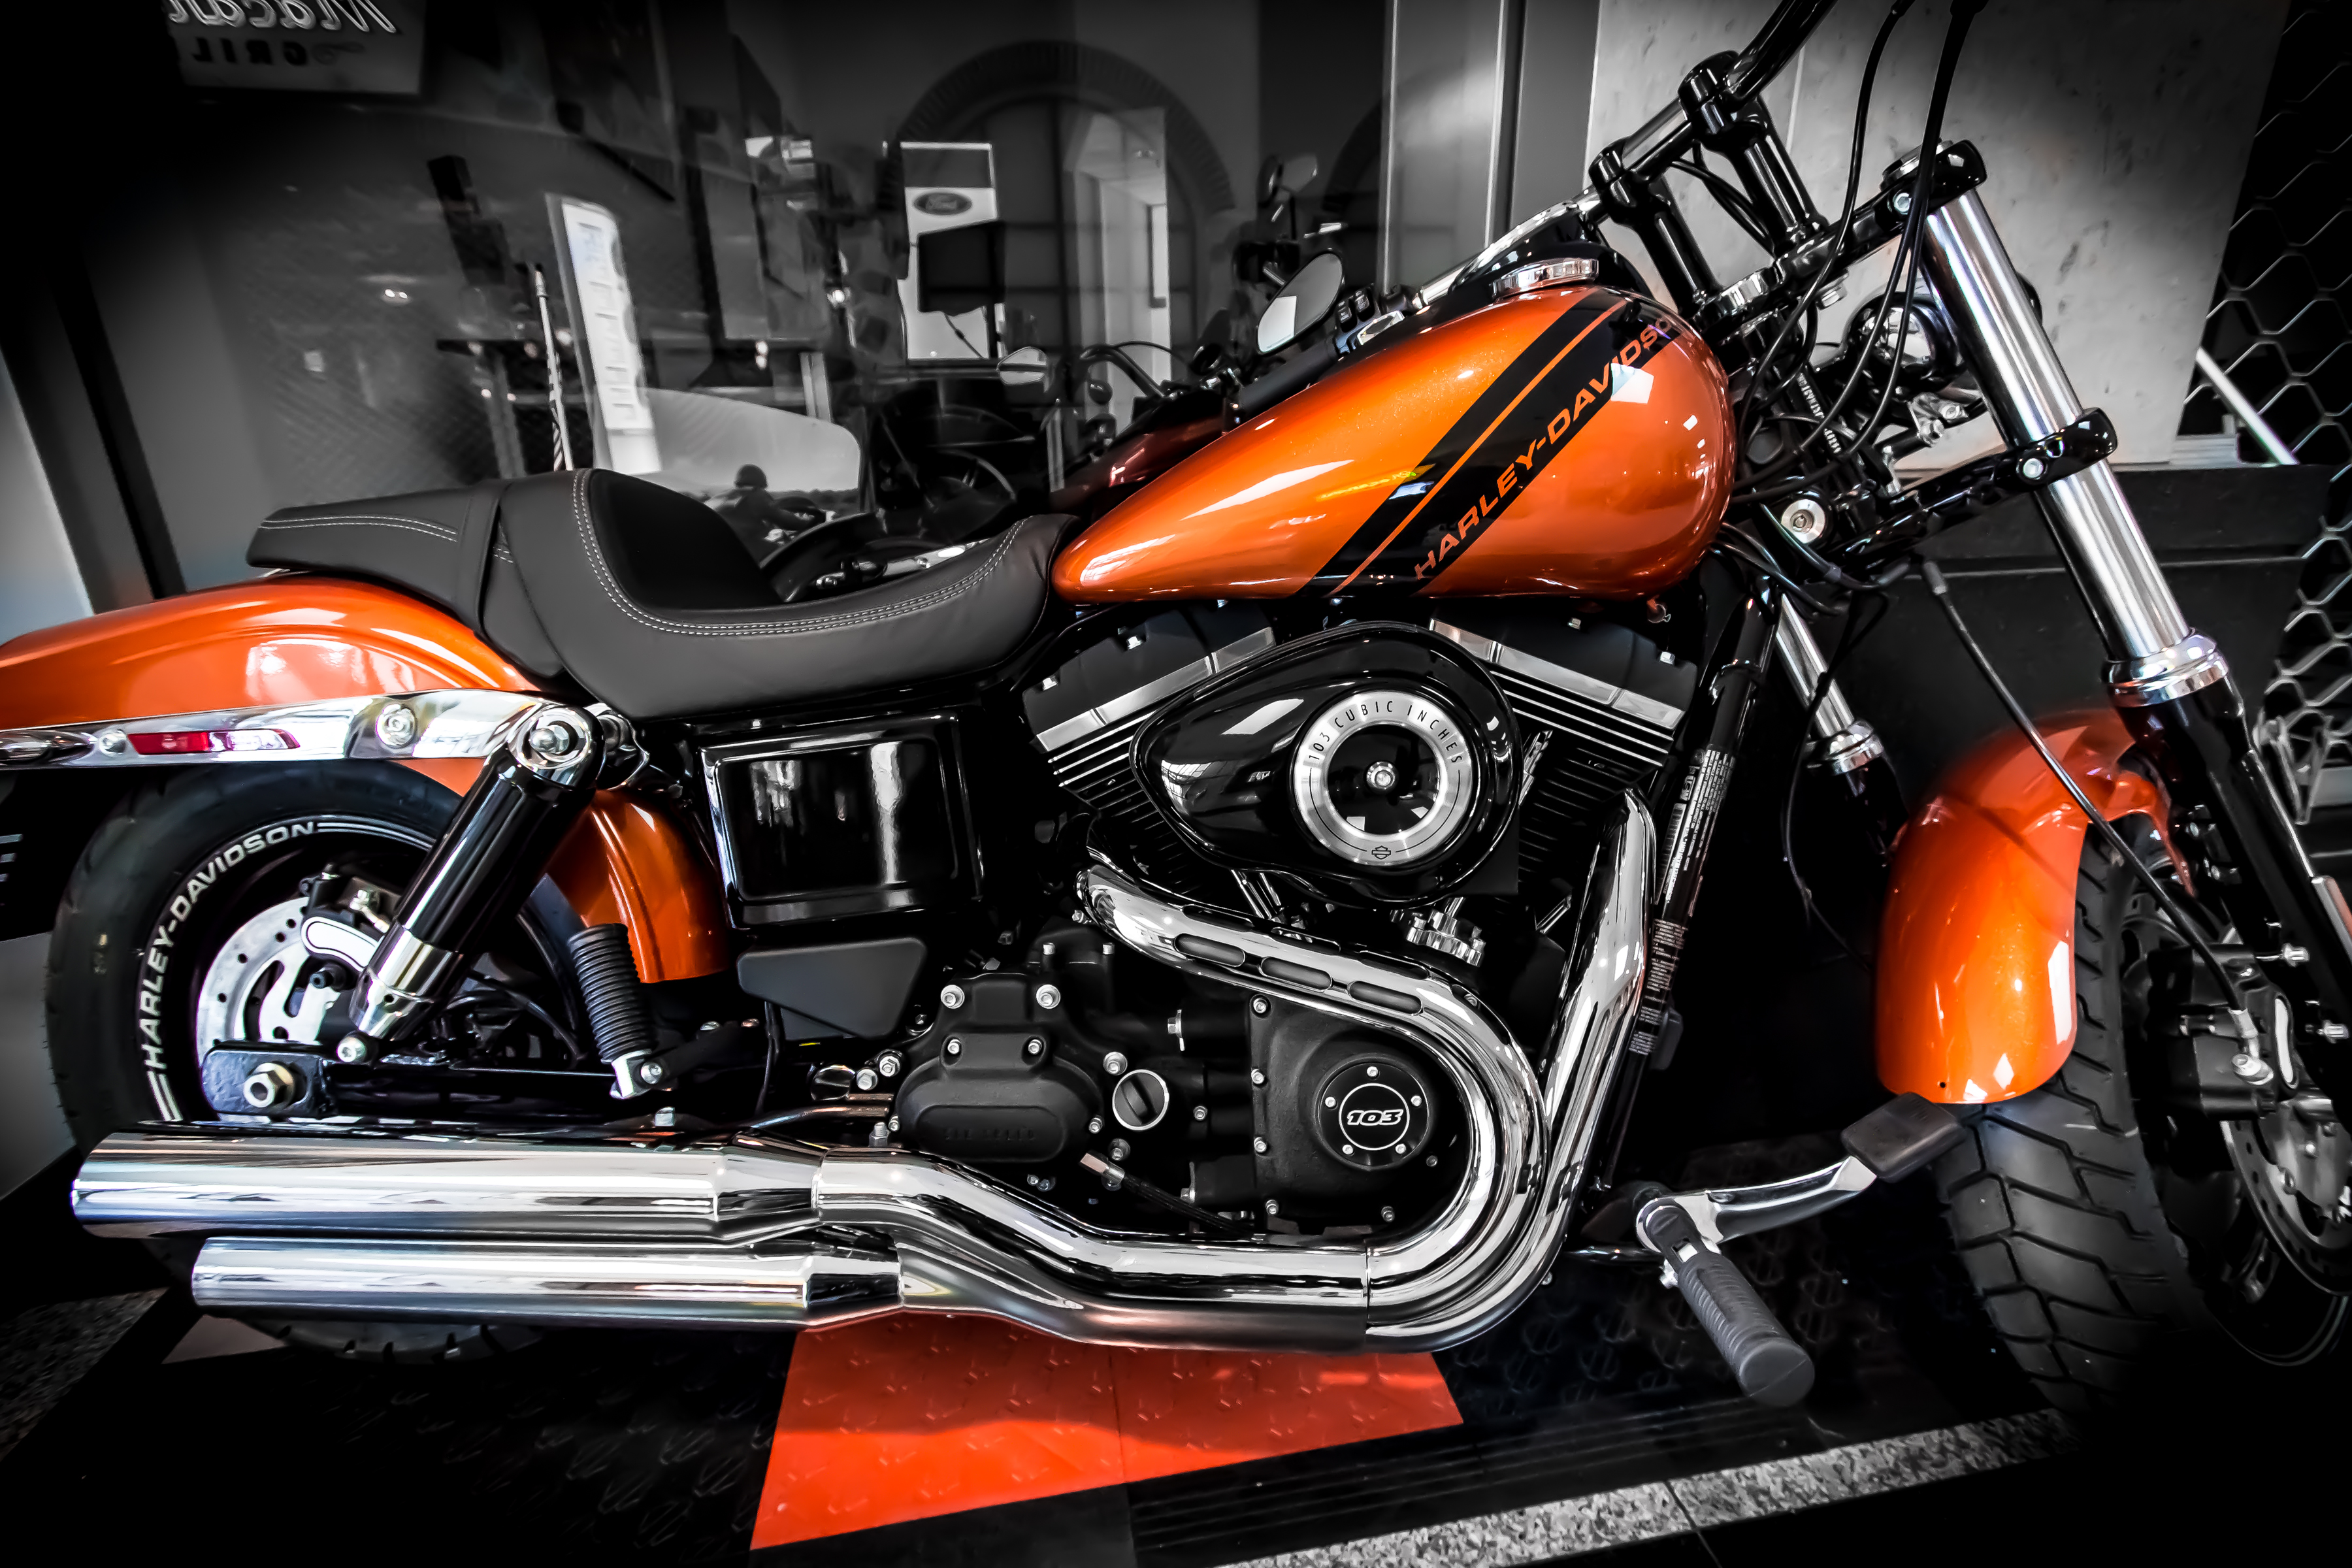 Harley Davidson Windshield Docking Kit Instructions